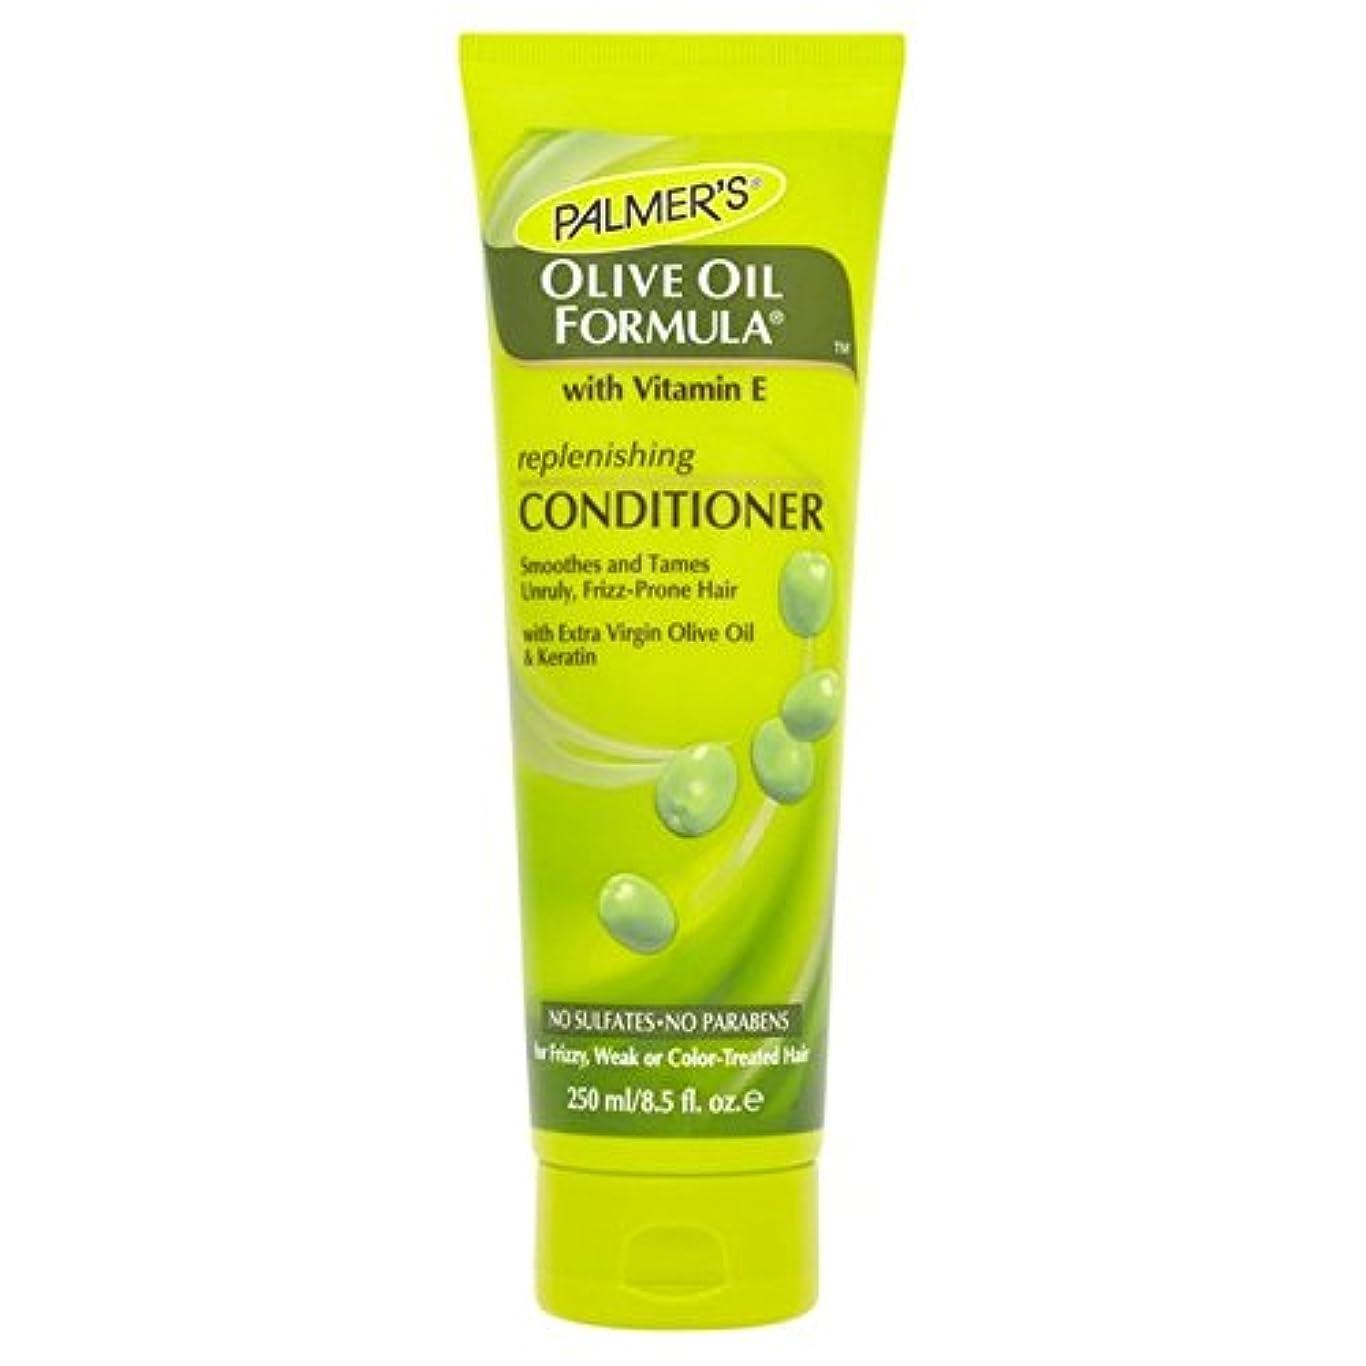 Palmer's Olive Oil Formula Restoring Conditioner 250ml (Pack of 6) - パーマーのオリーブオイル式リストアコンディショナー250 x6 [並行輸入品]